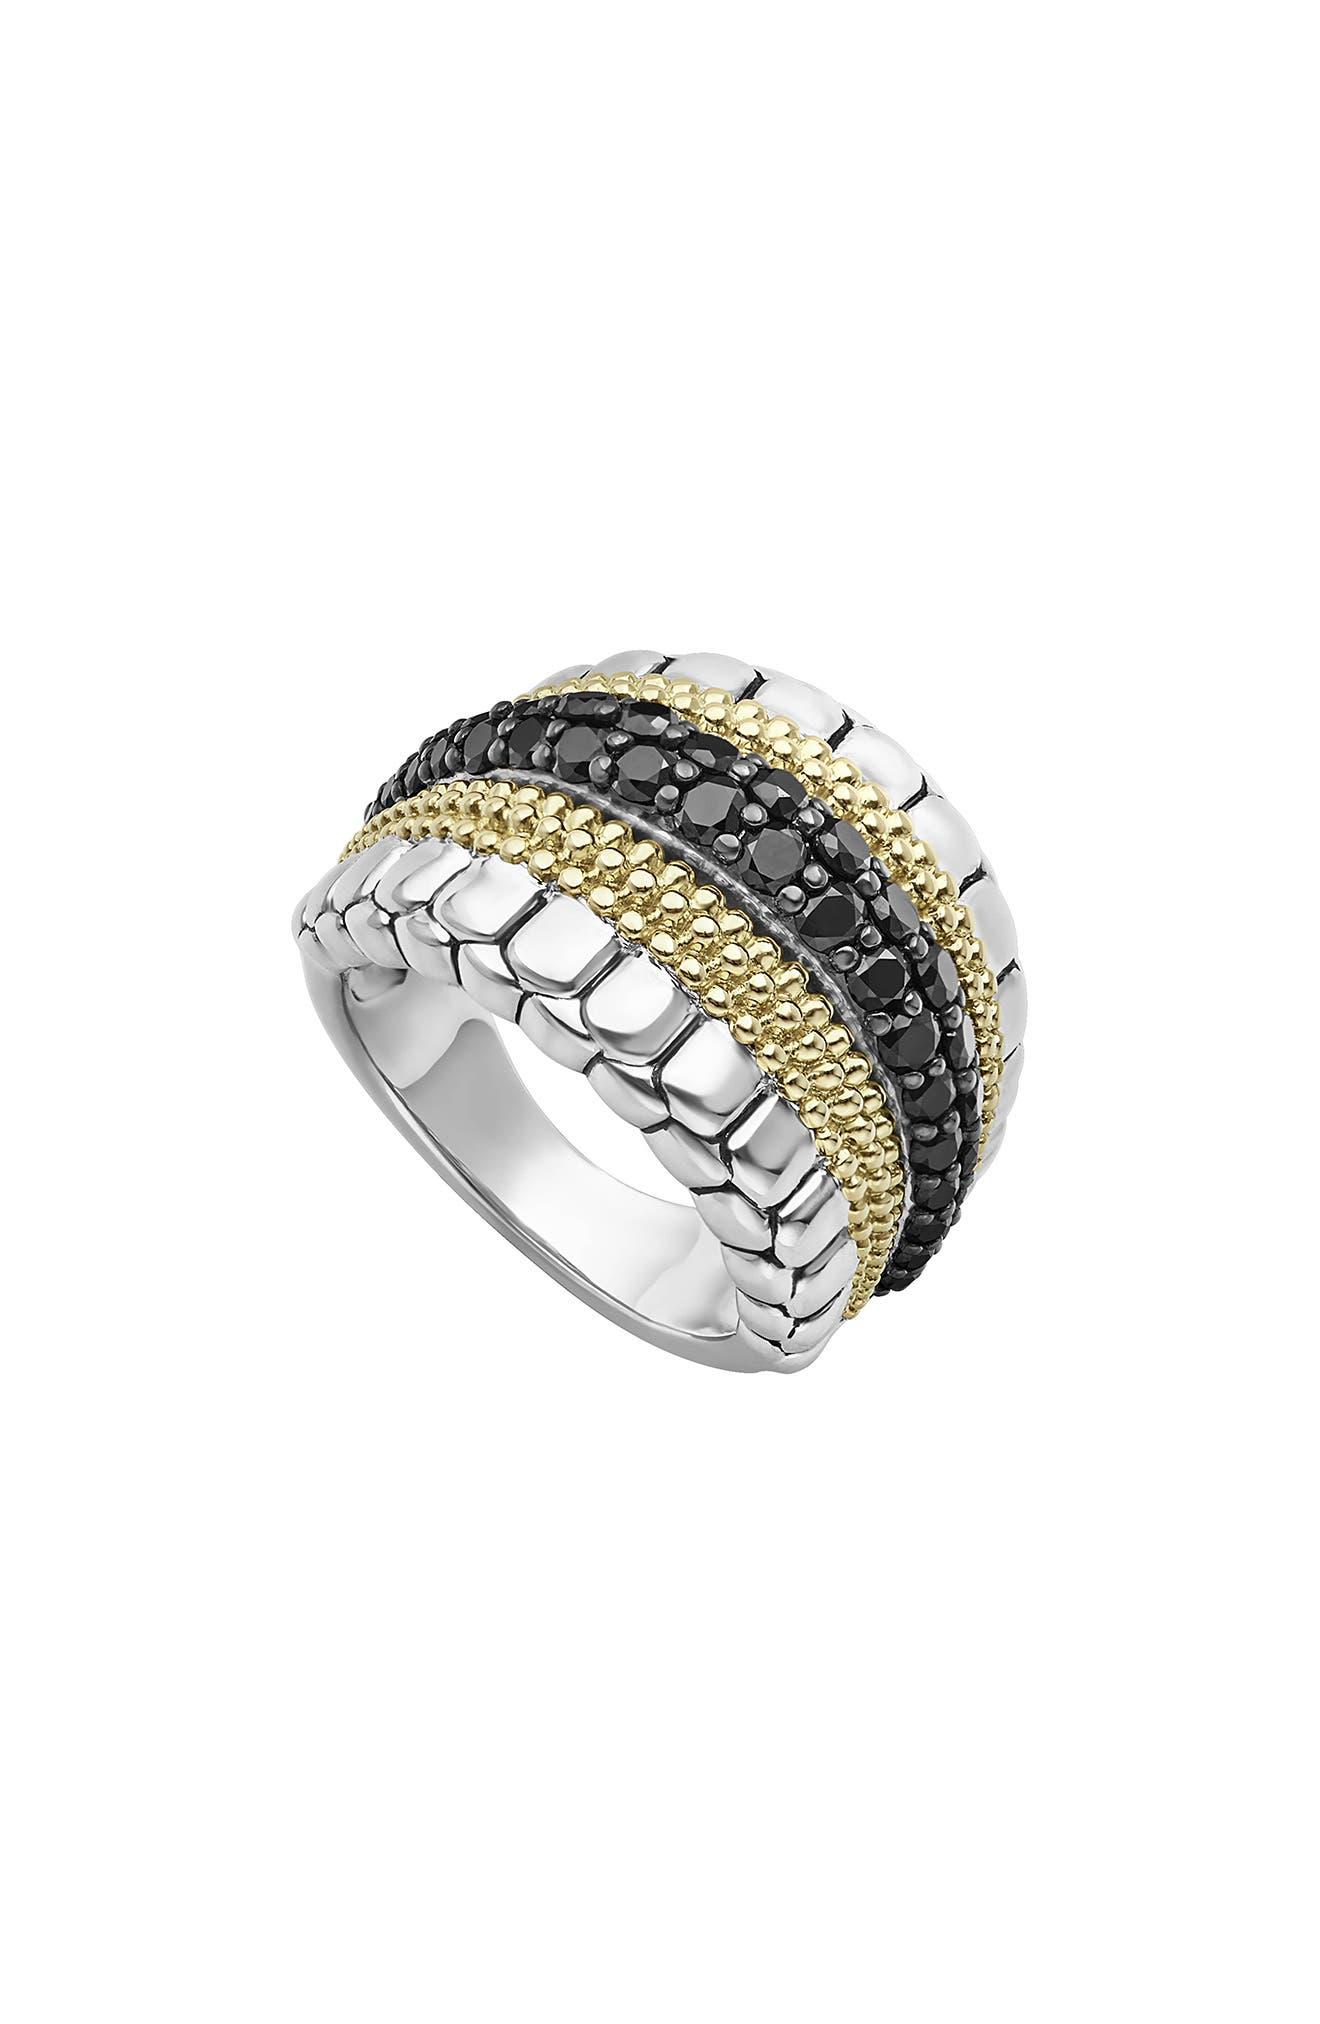 Diamond Lux Black Diamond Band Ring,                         Main,                         color, SILVER/ GOLD/ BLACK DIAMOND